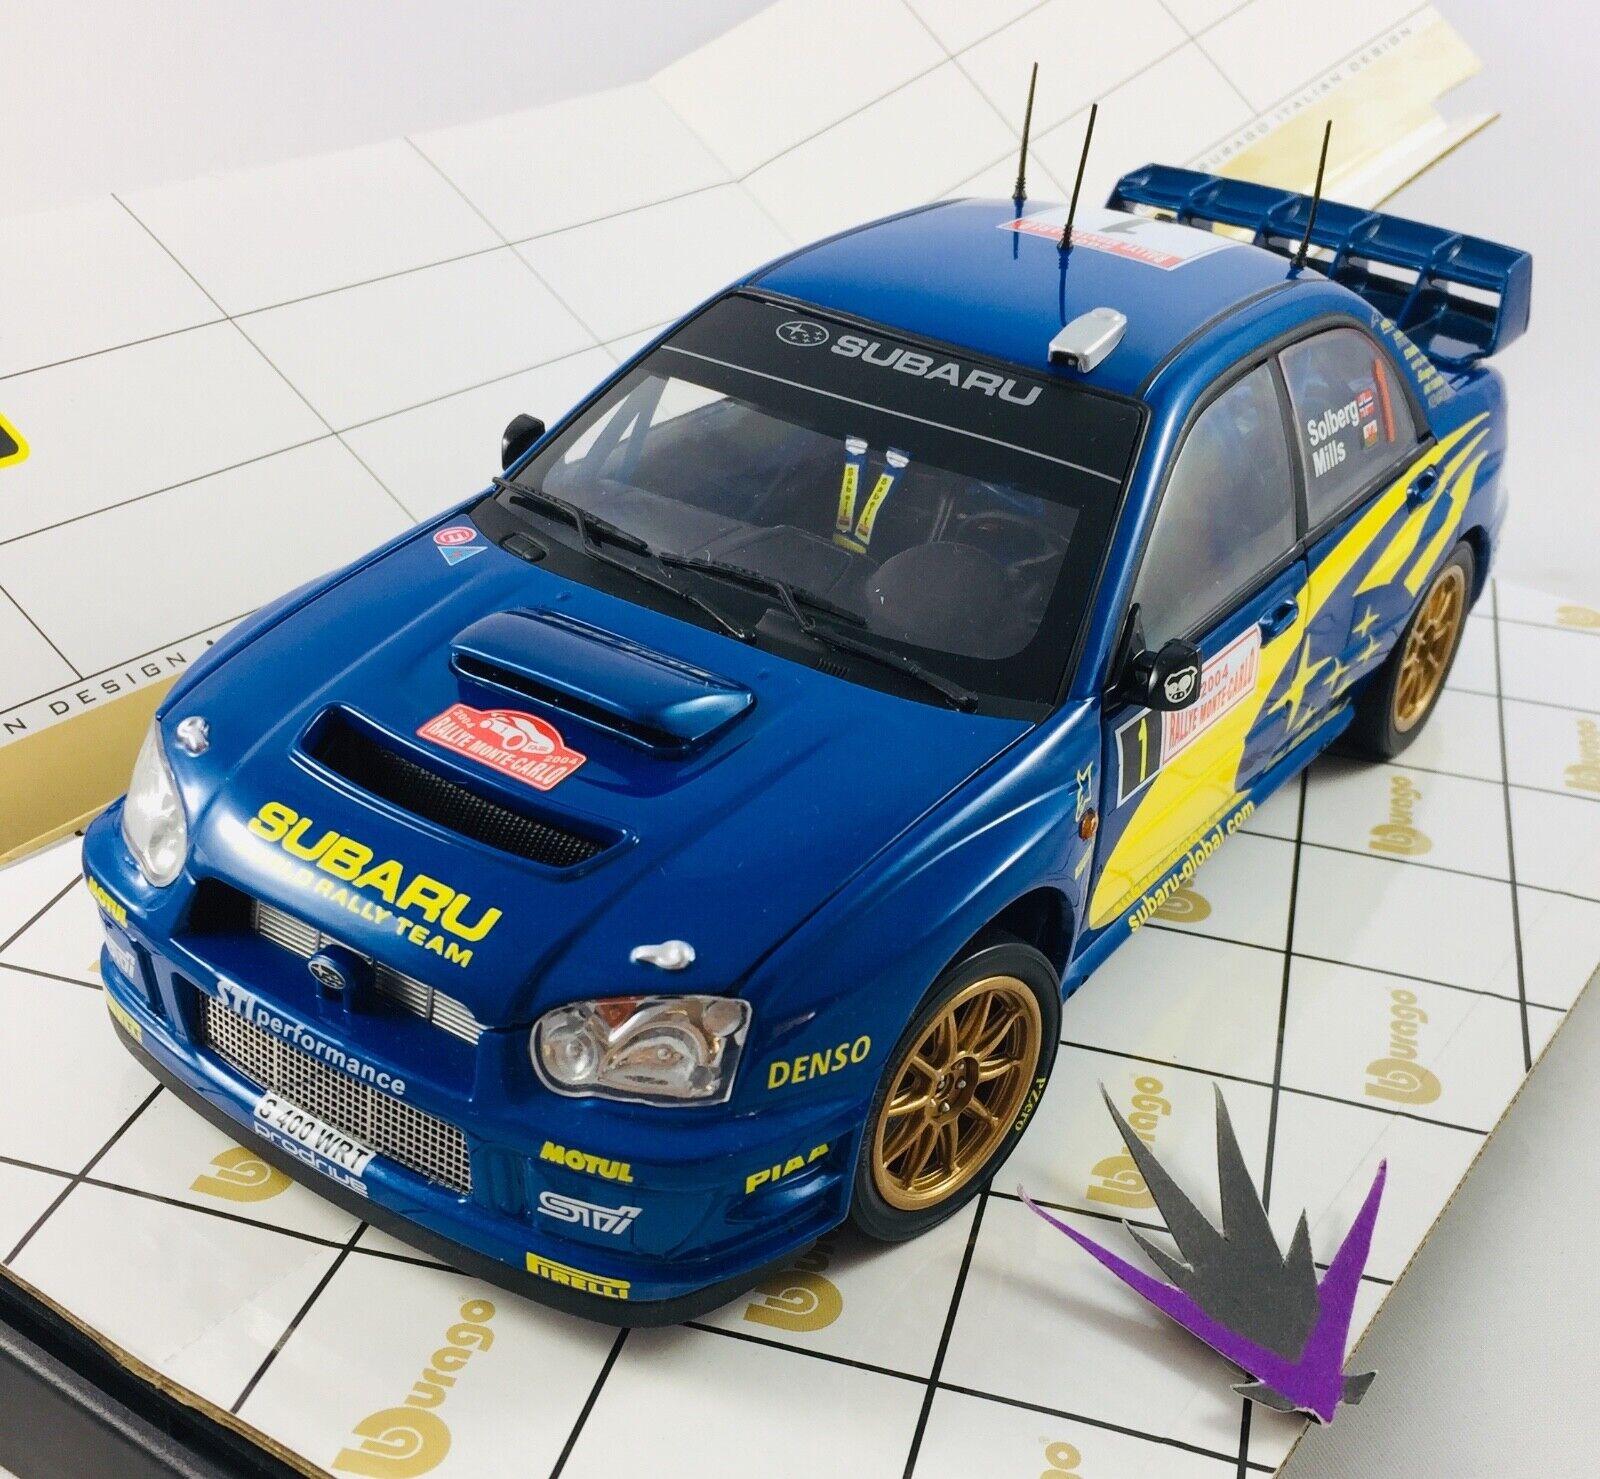 Bburago Subaru Impreza WRC Rallye Monte Carlo 1 18 with box